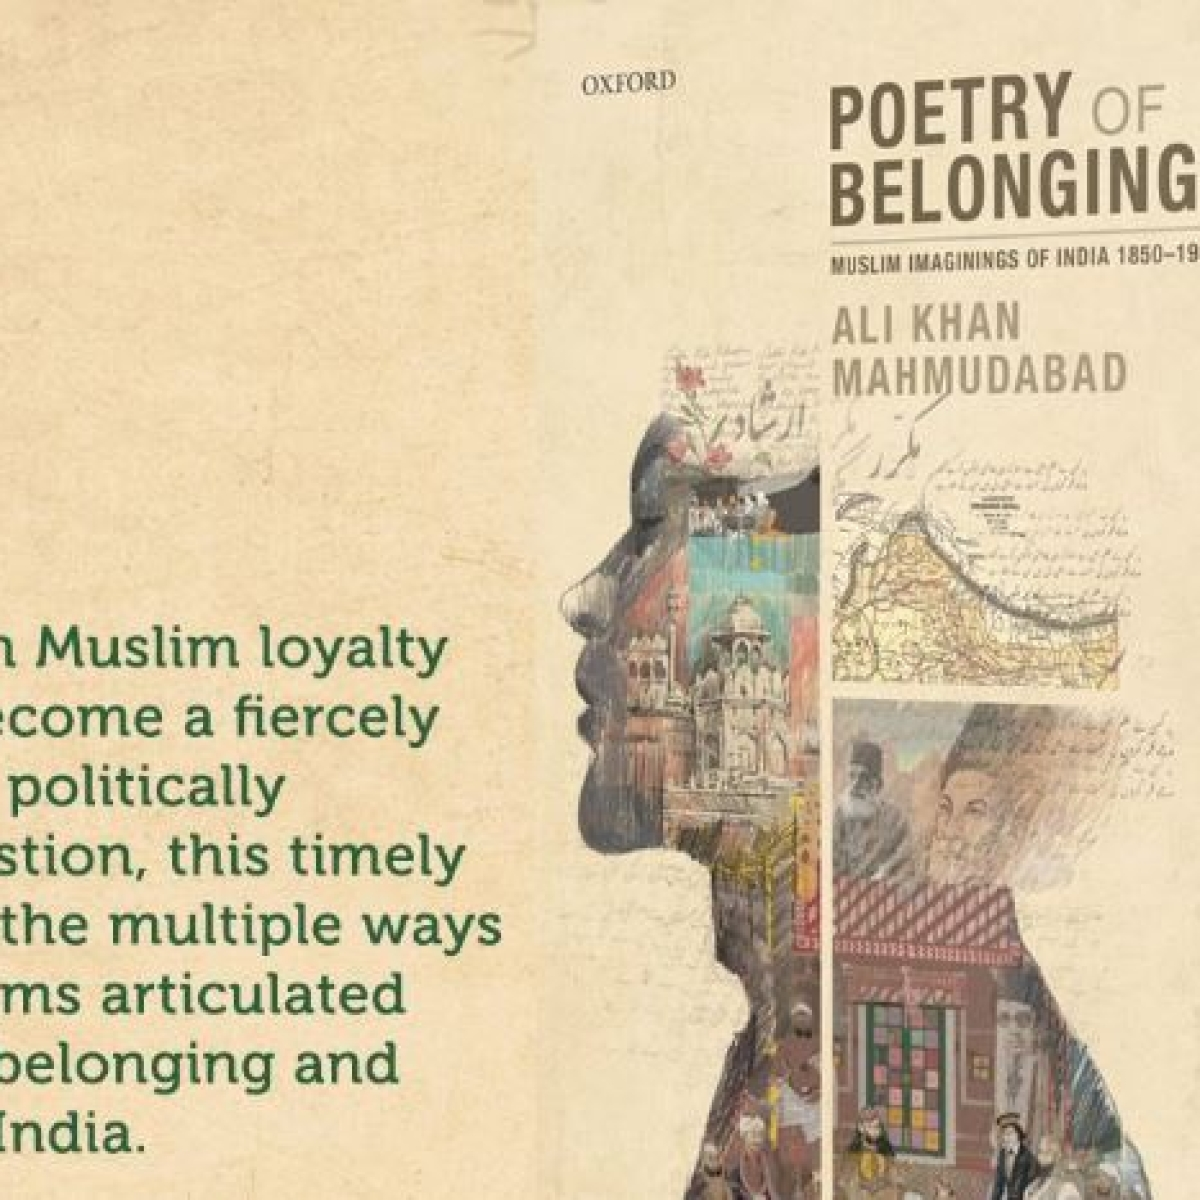 Oxford University Press launches 'Poetry of Belonging': Muslim Imaginings of India 1850–1950